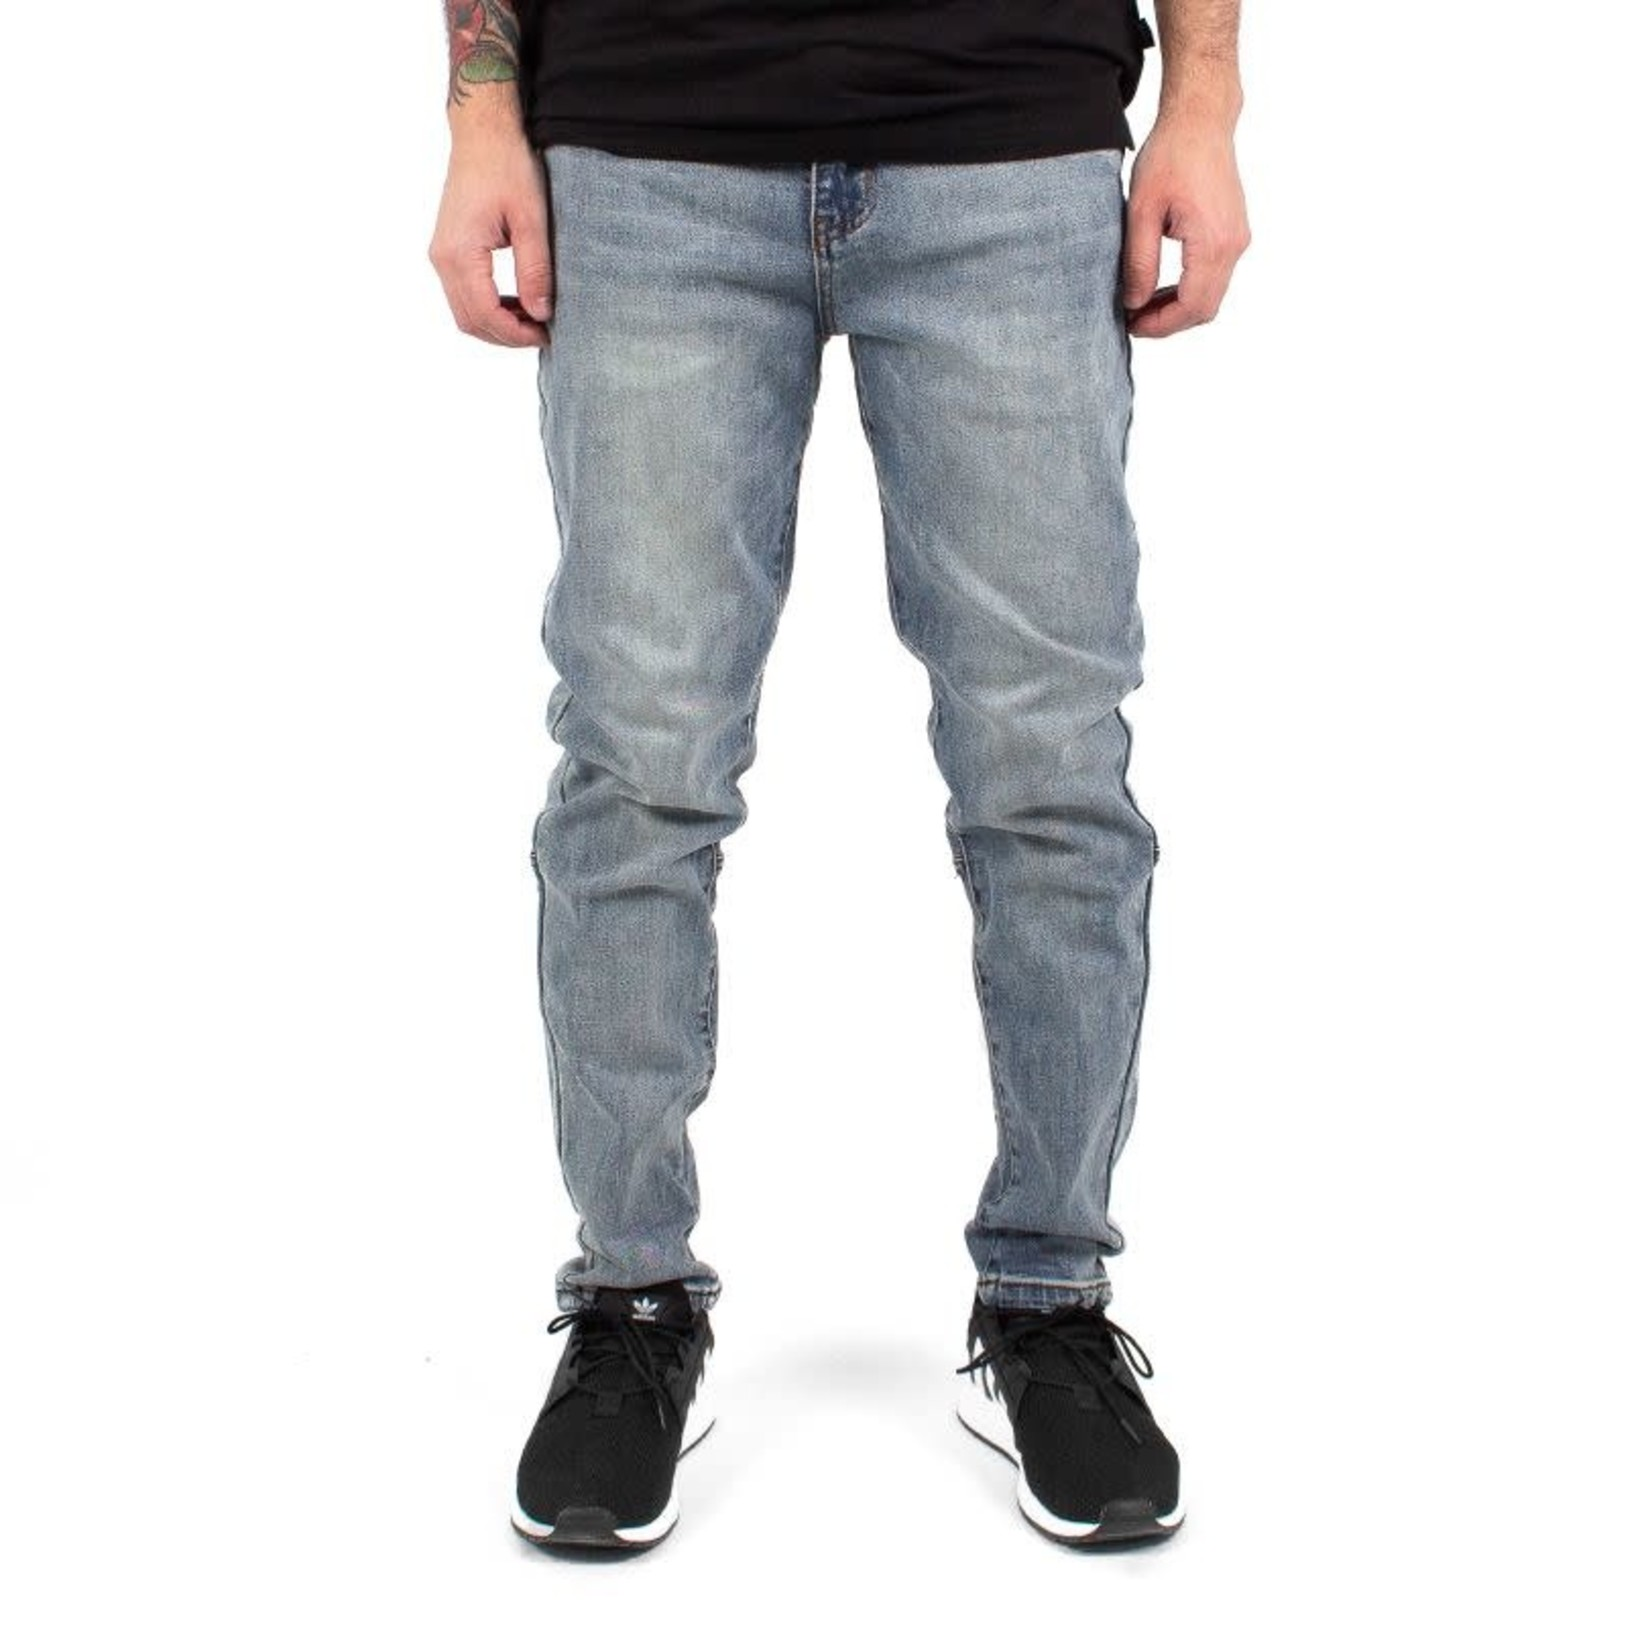 WLKN WLKN : Larry Regular Fit Denim Pants